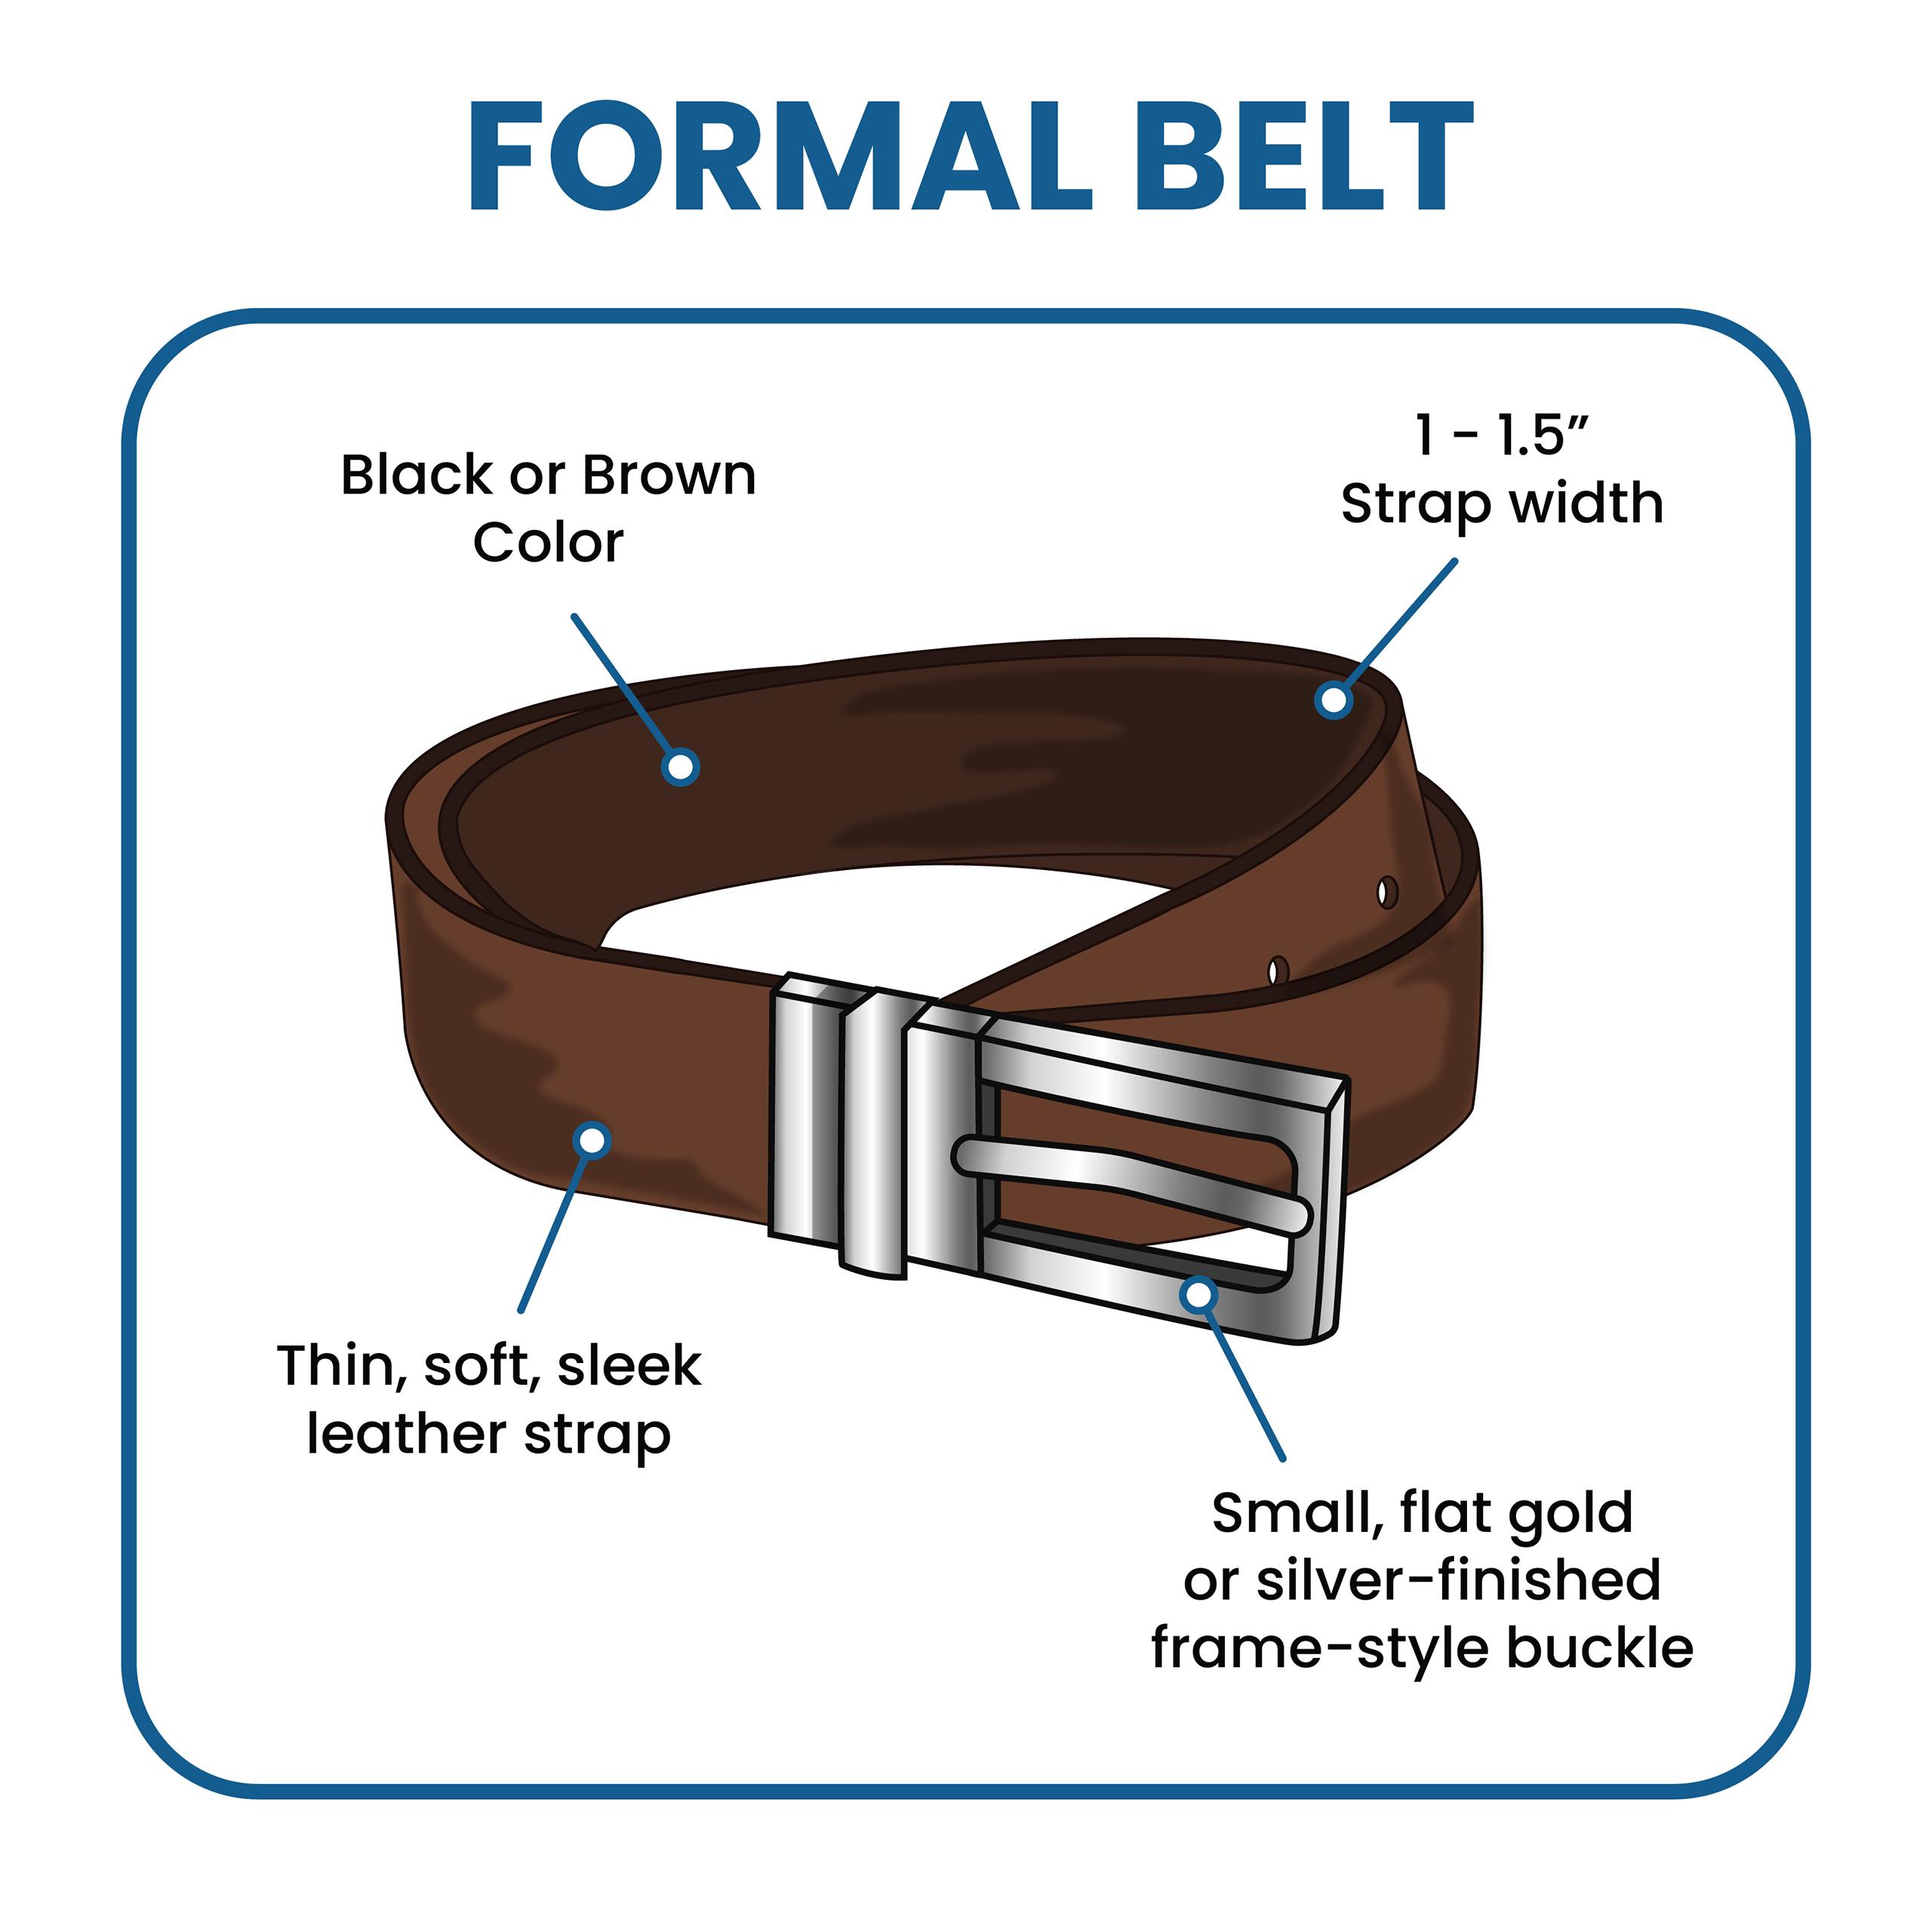 formal belt features